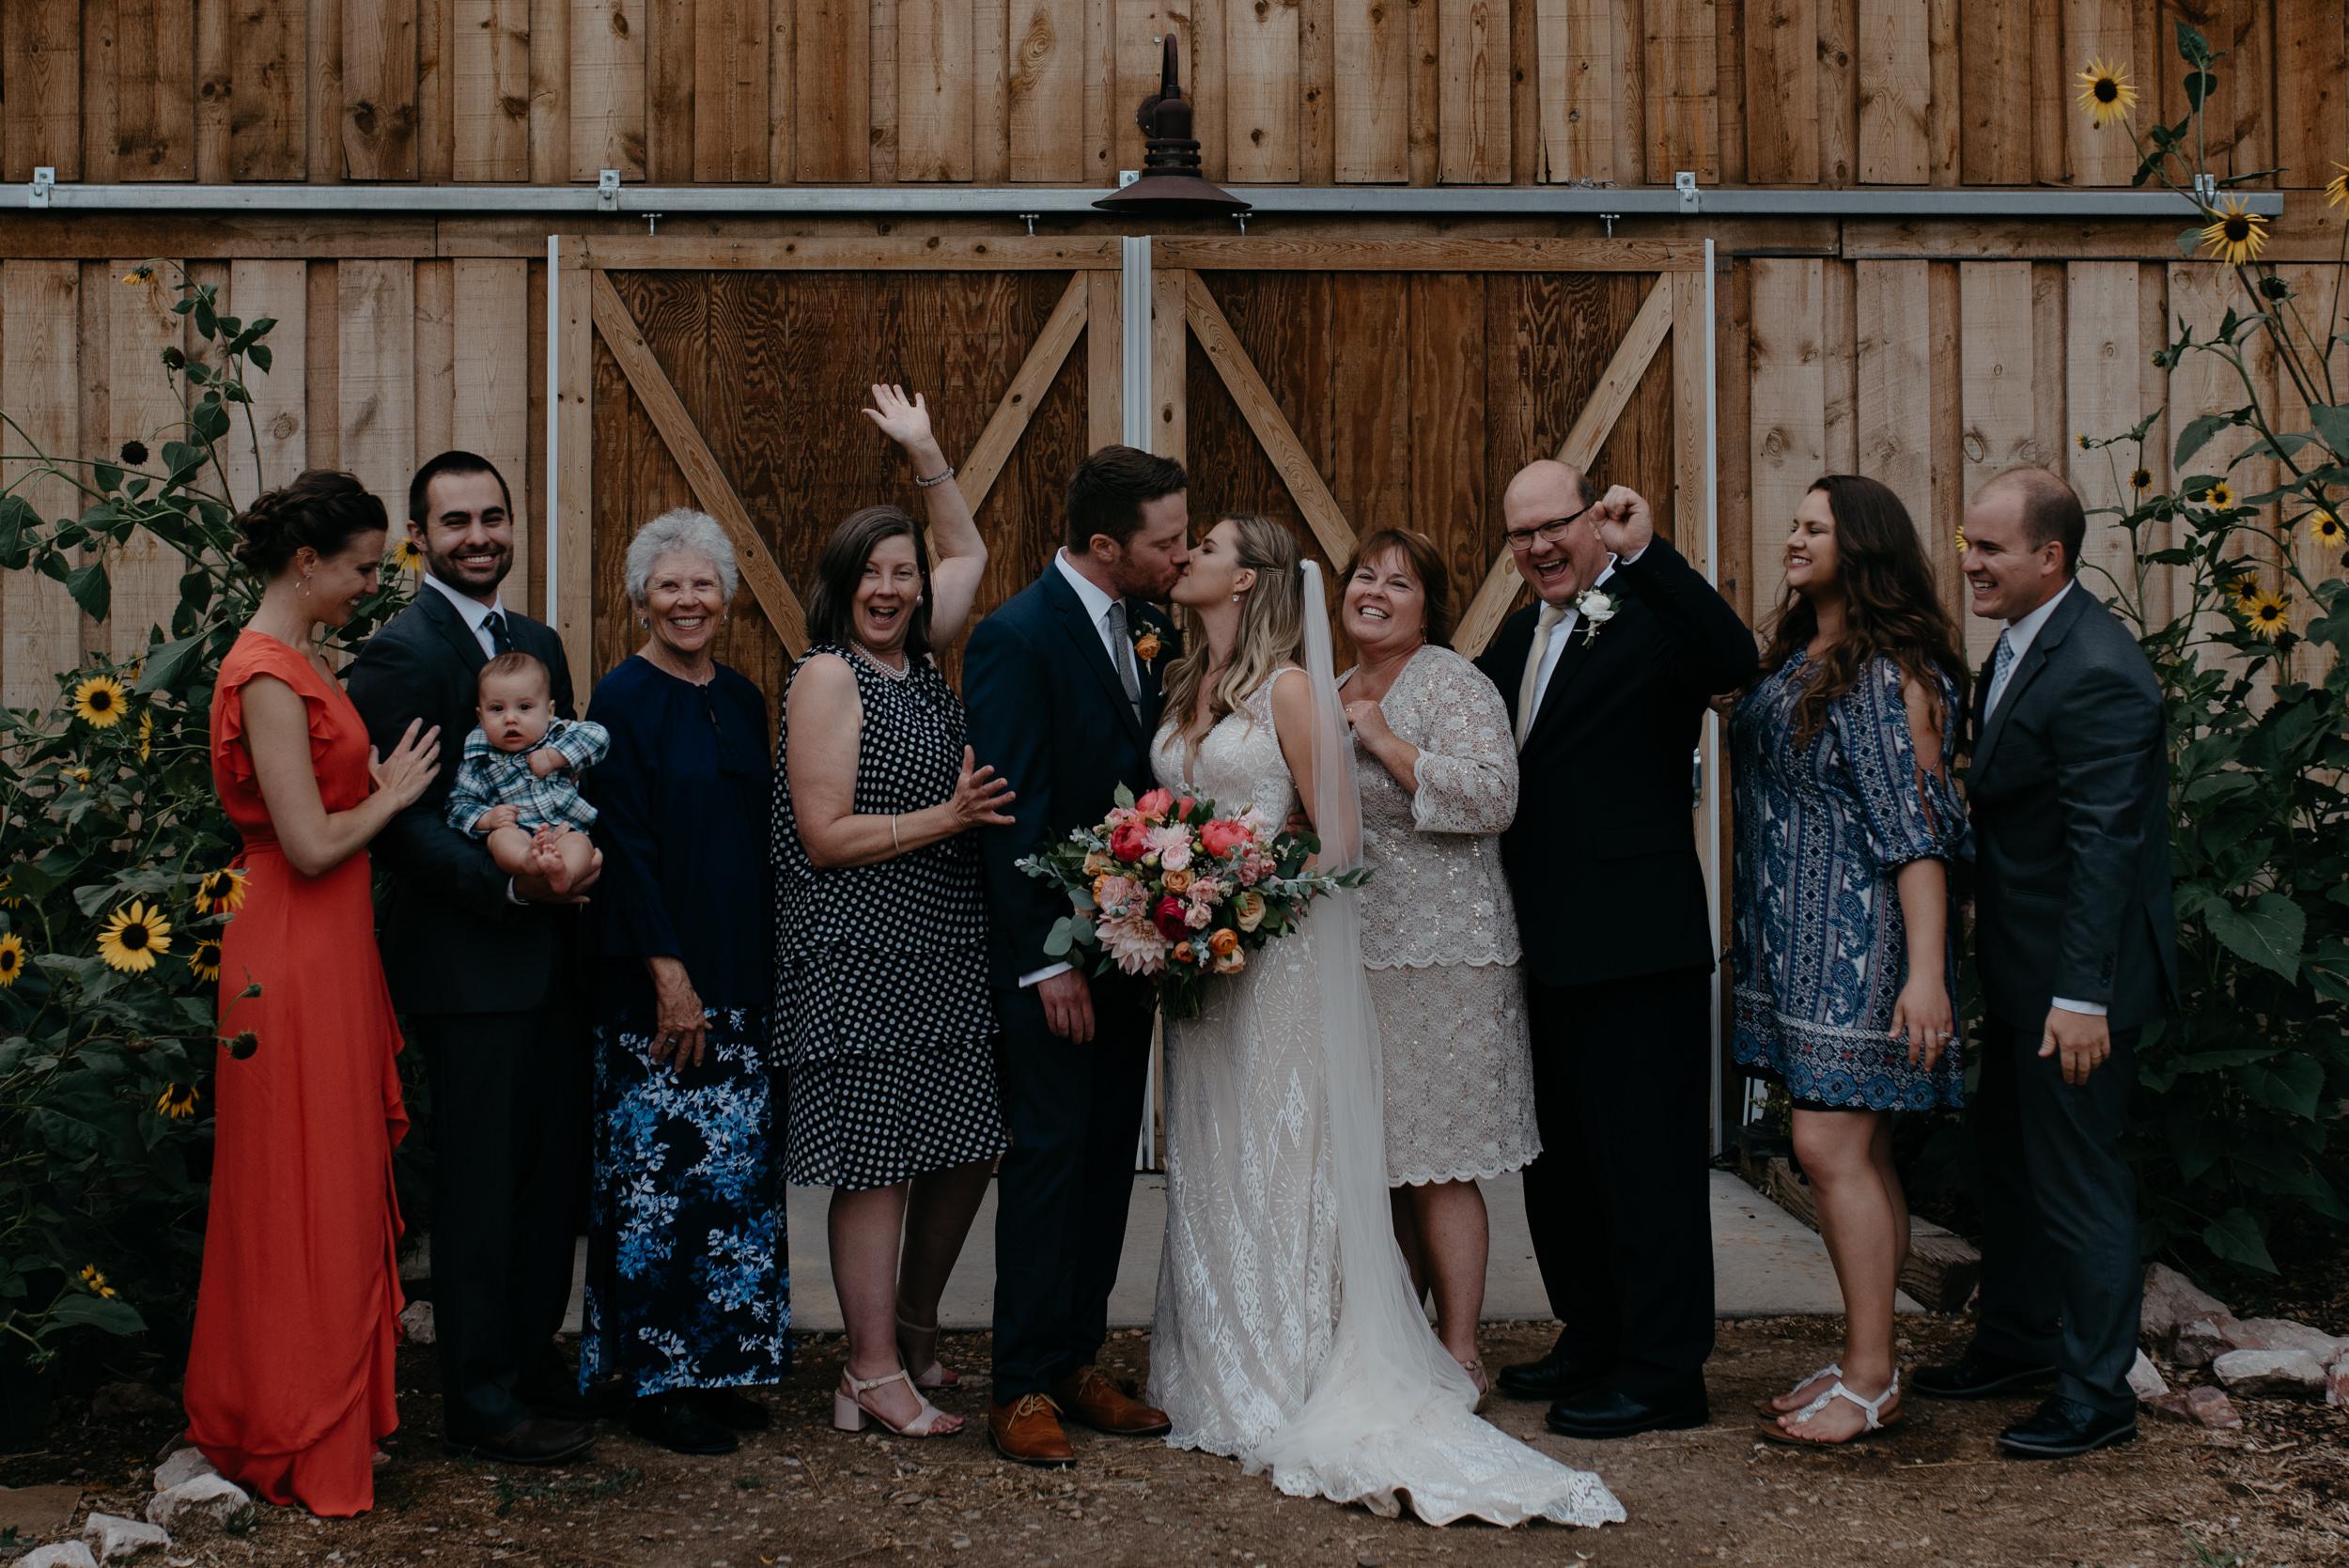 Family photo inspiration. Boulder, Colorado wedding at Three Leaf Farm. Colorado wedding and elopement photographer.